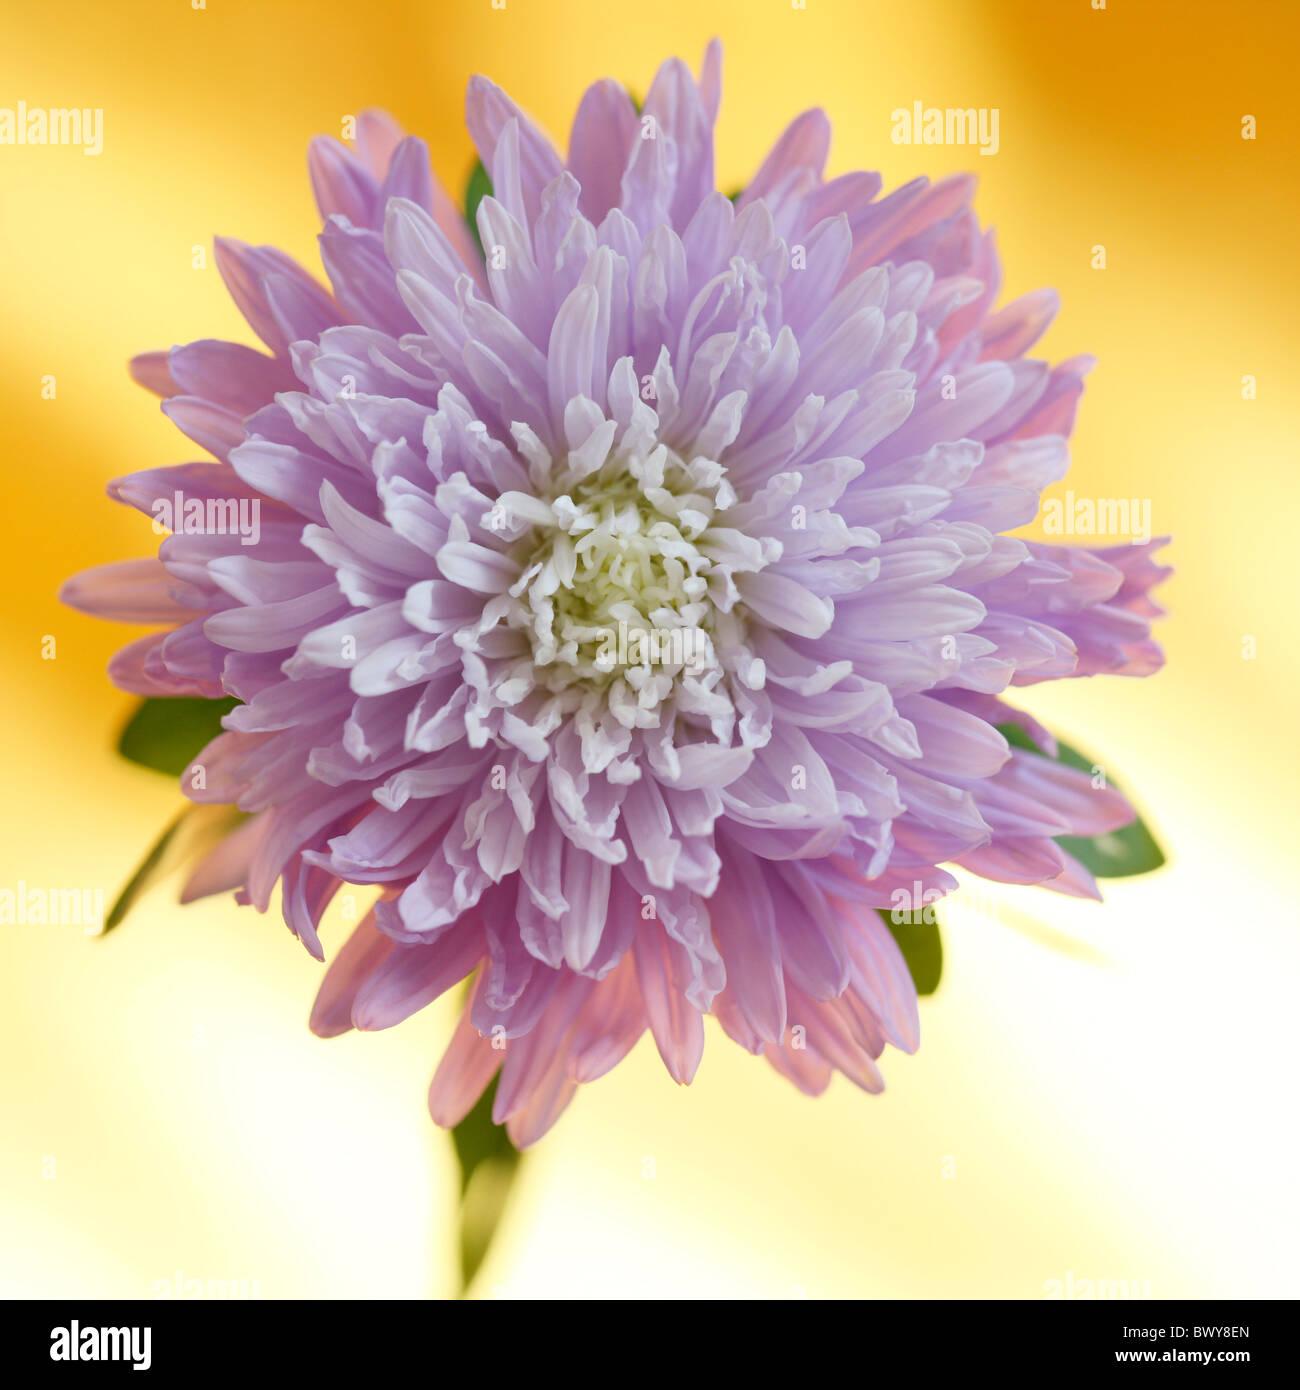 wunderschöne lila Aster in voller Blüte Jane Ann Butler Fotografie JABP872 Stockbild